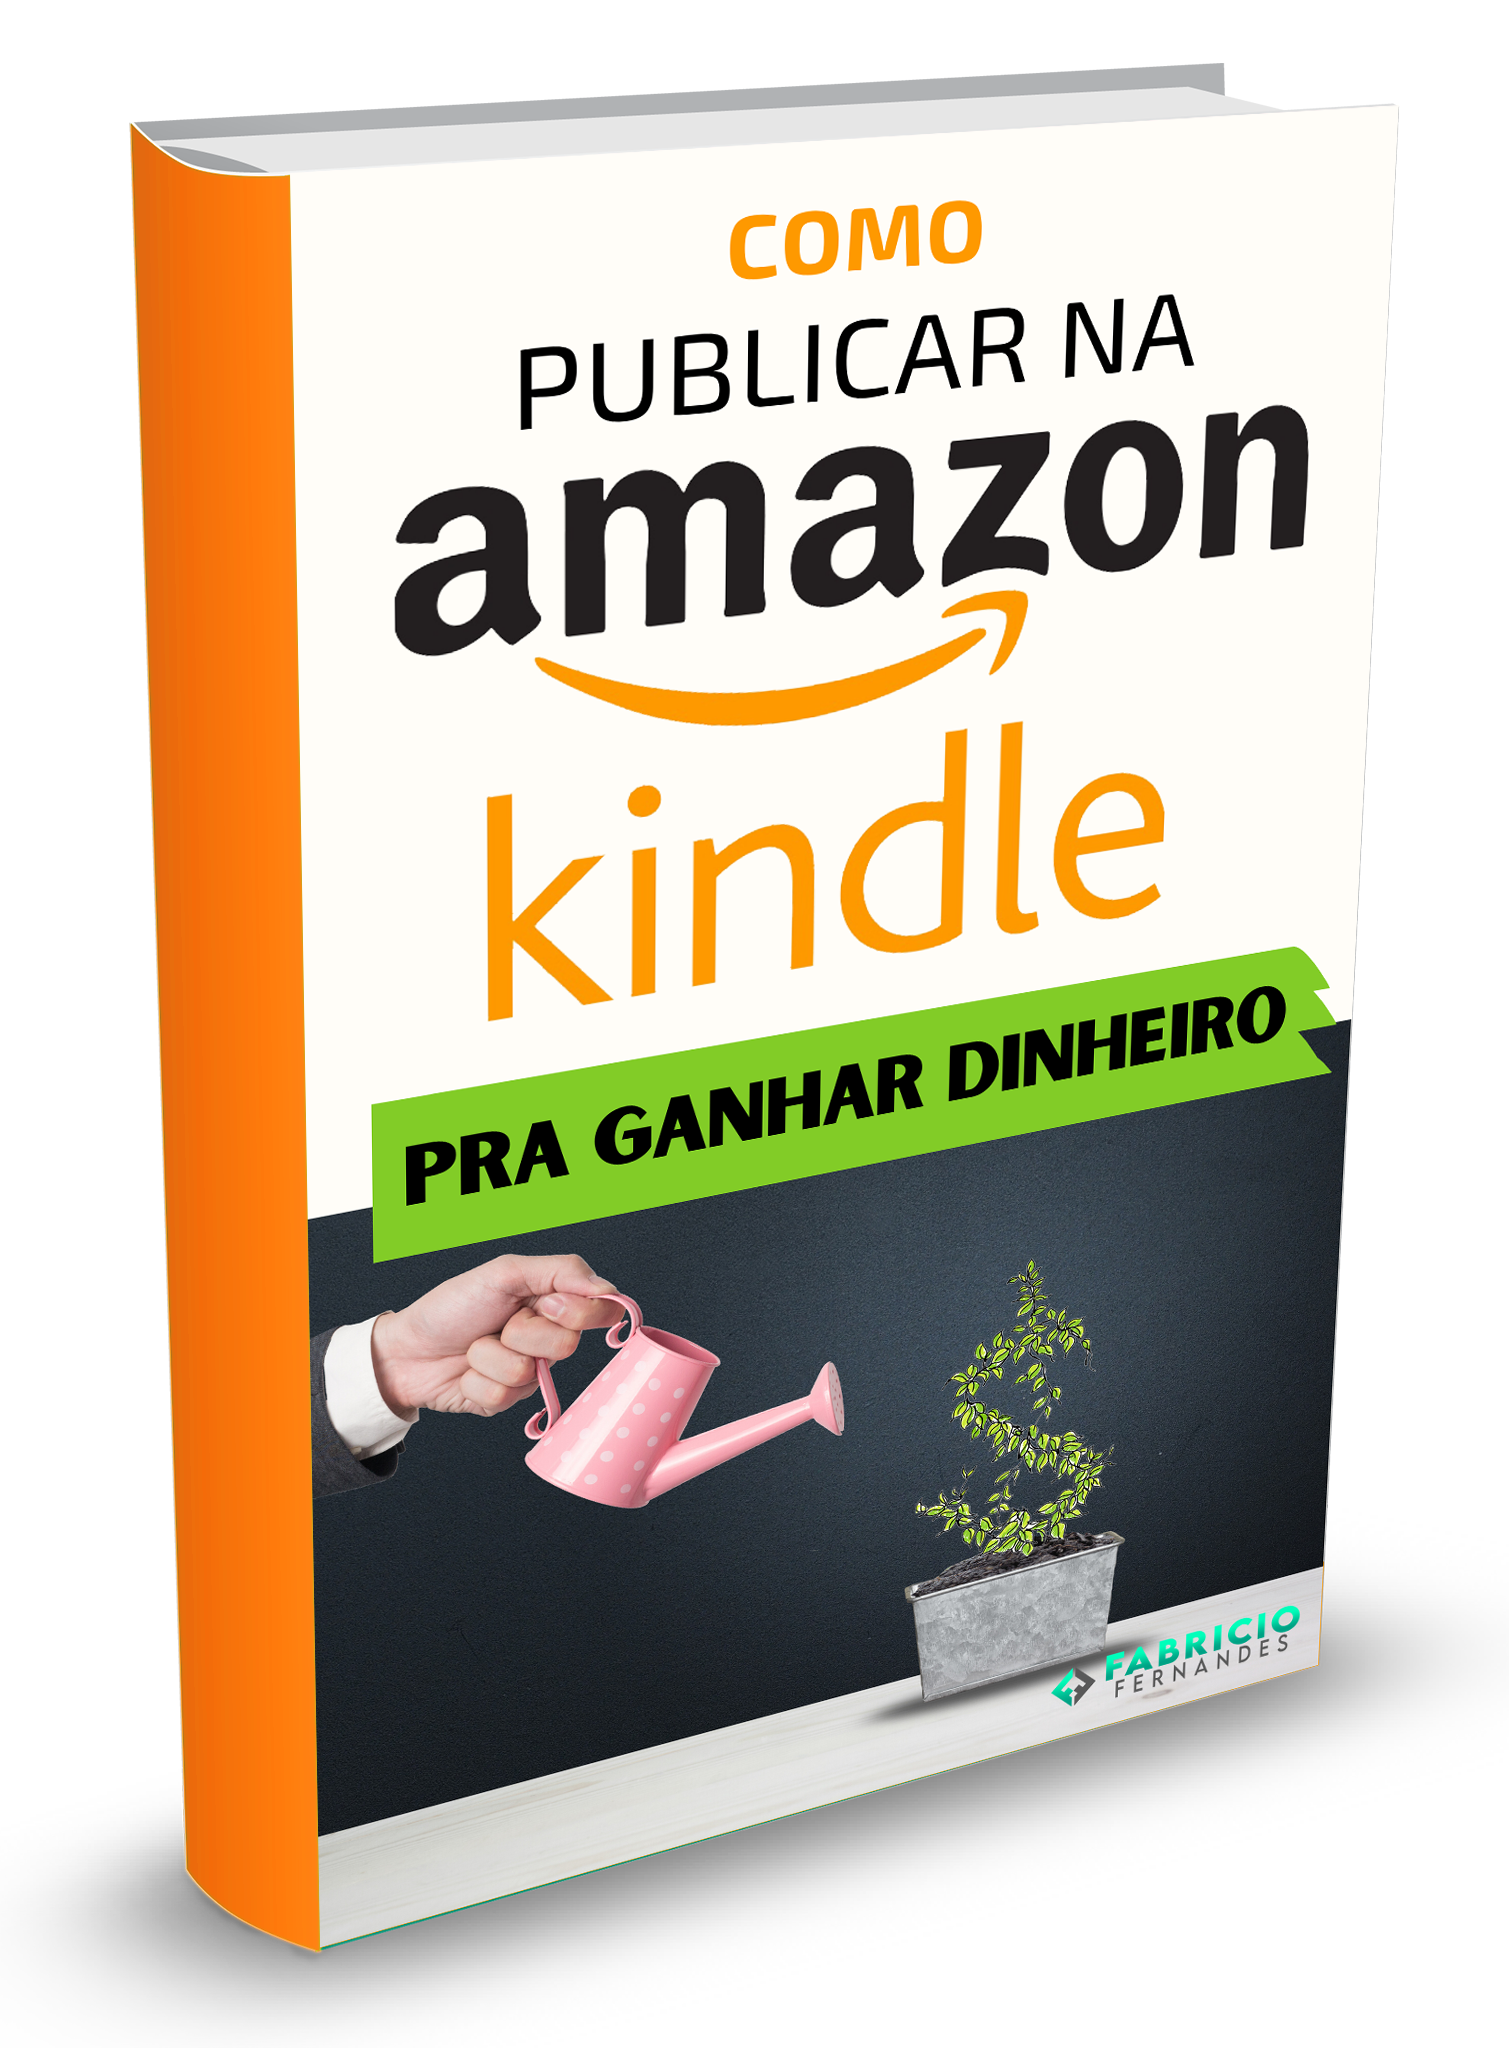 ebook-publicar-na-amazon-kindle-2500x2061